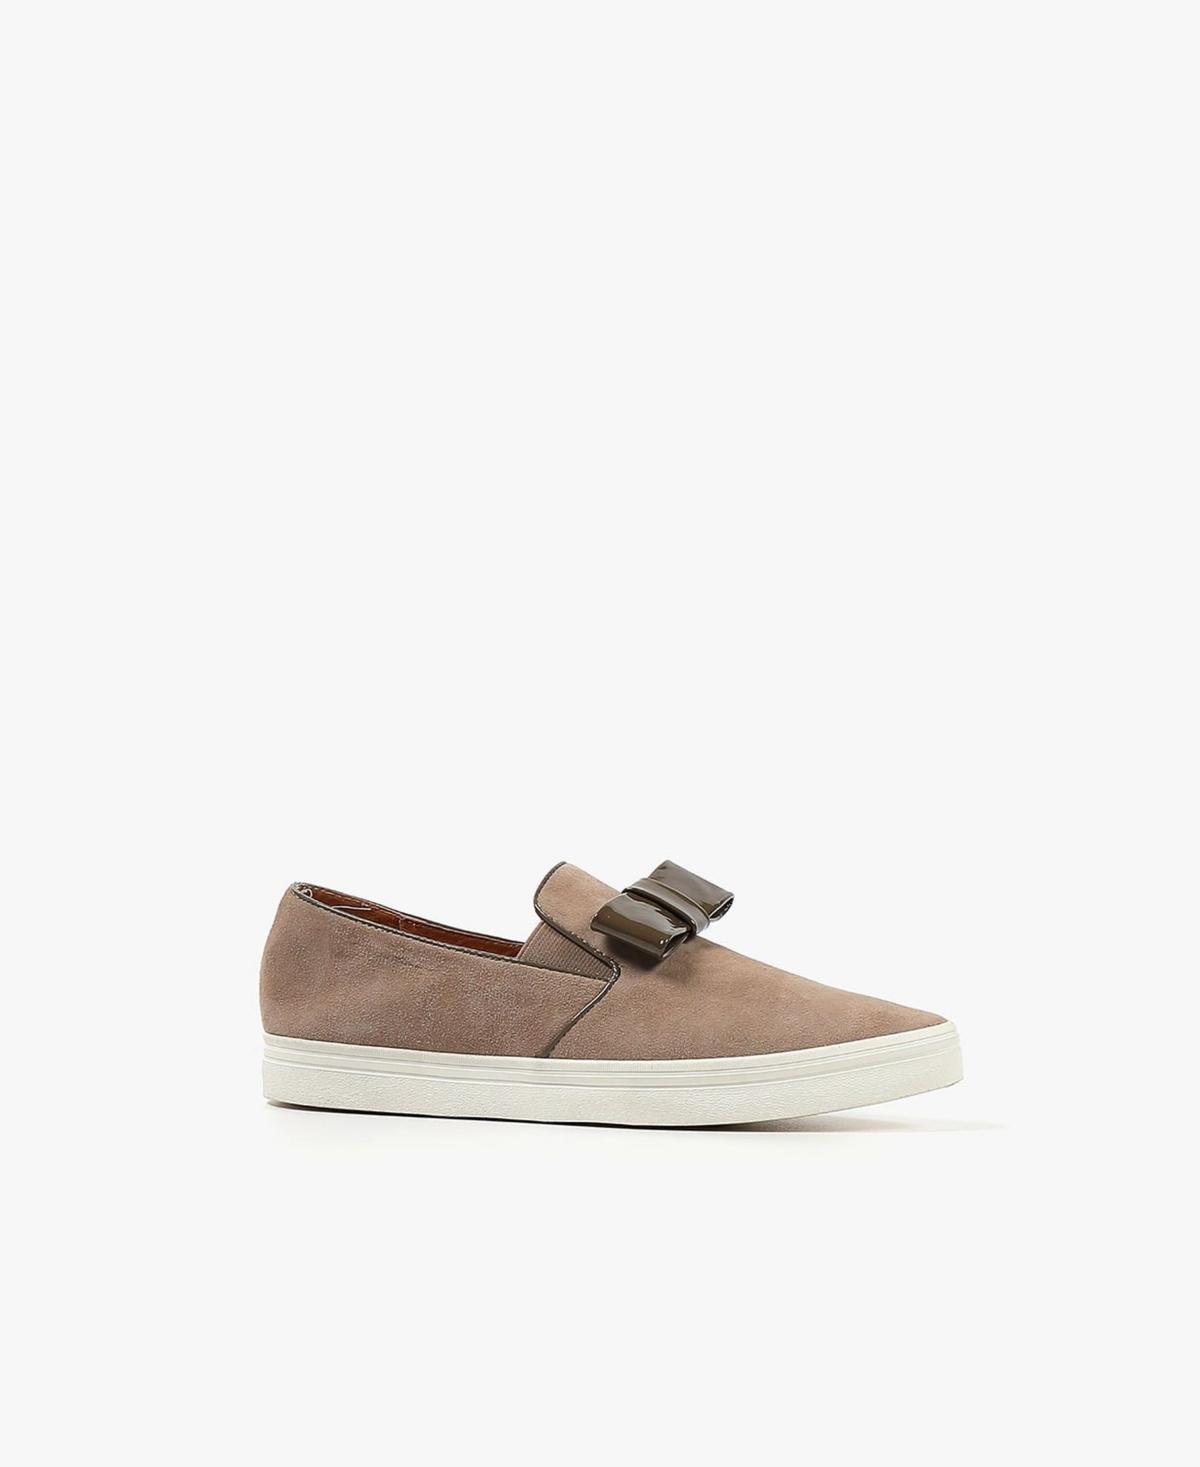 Tux Slip-On Women's Shoes